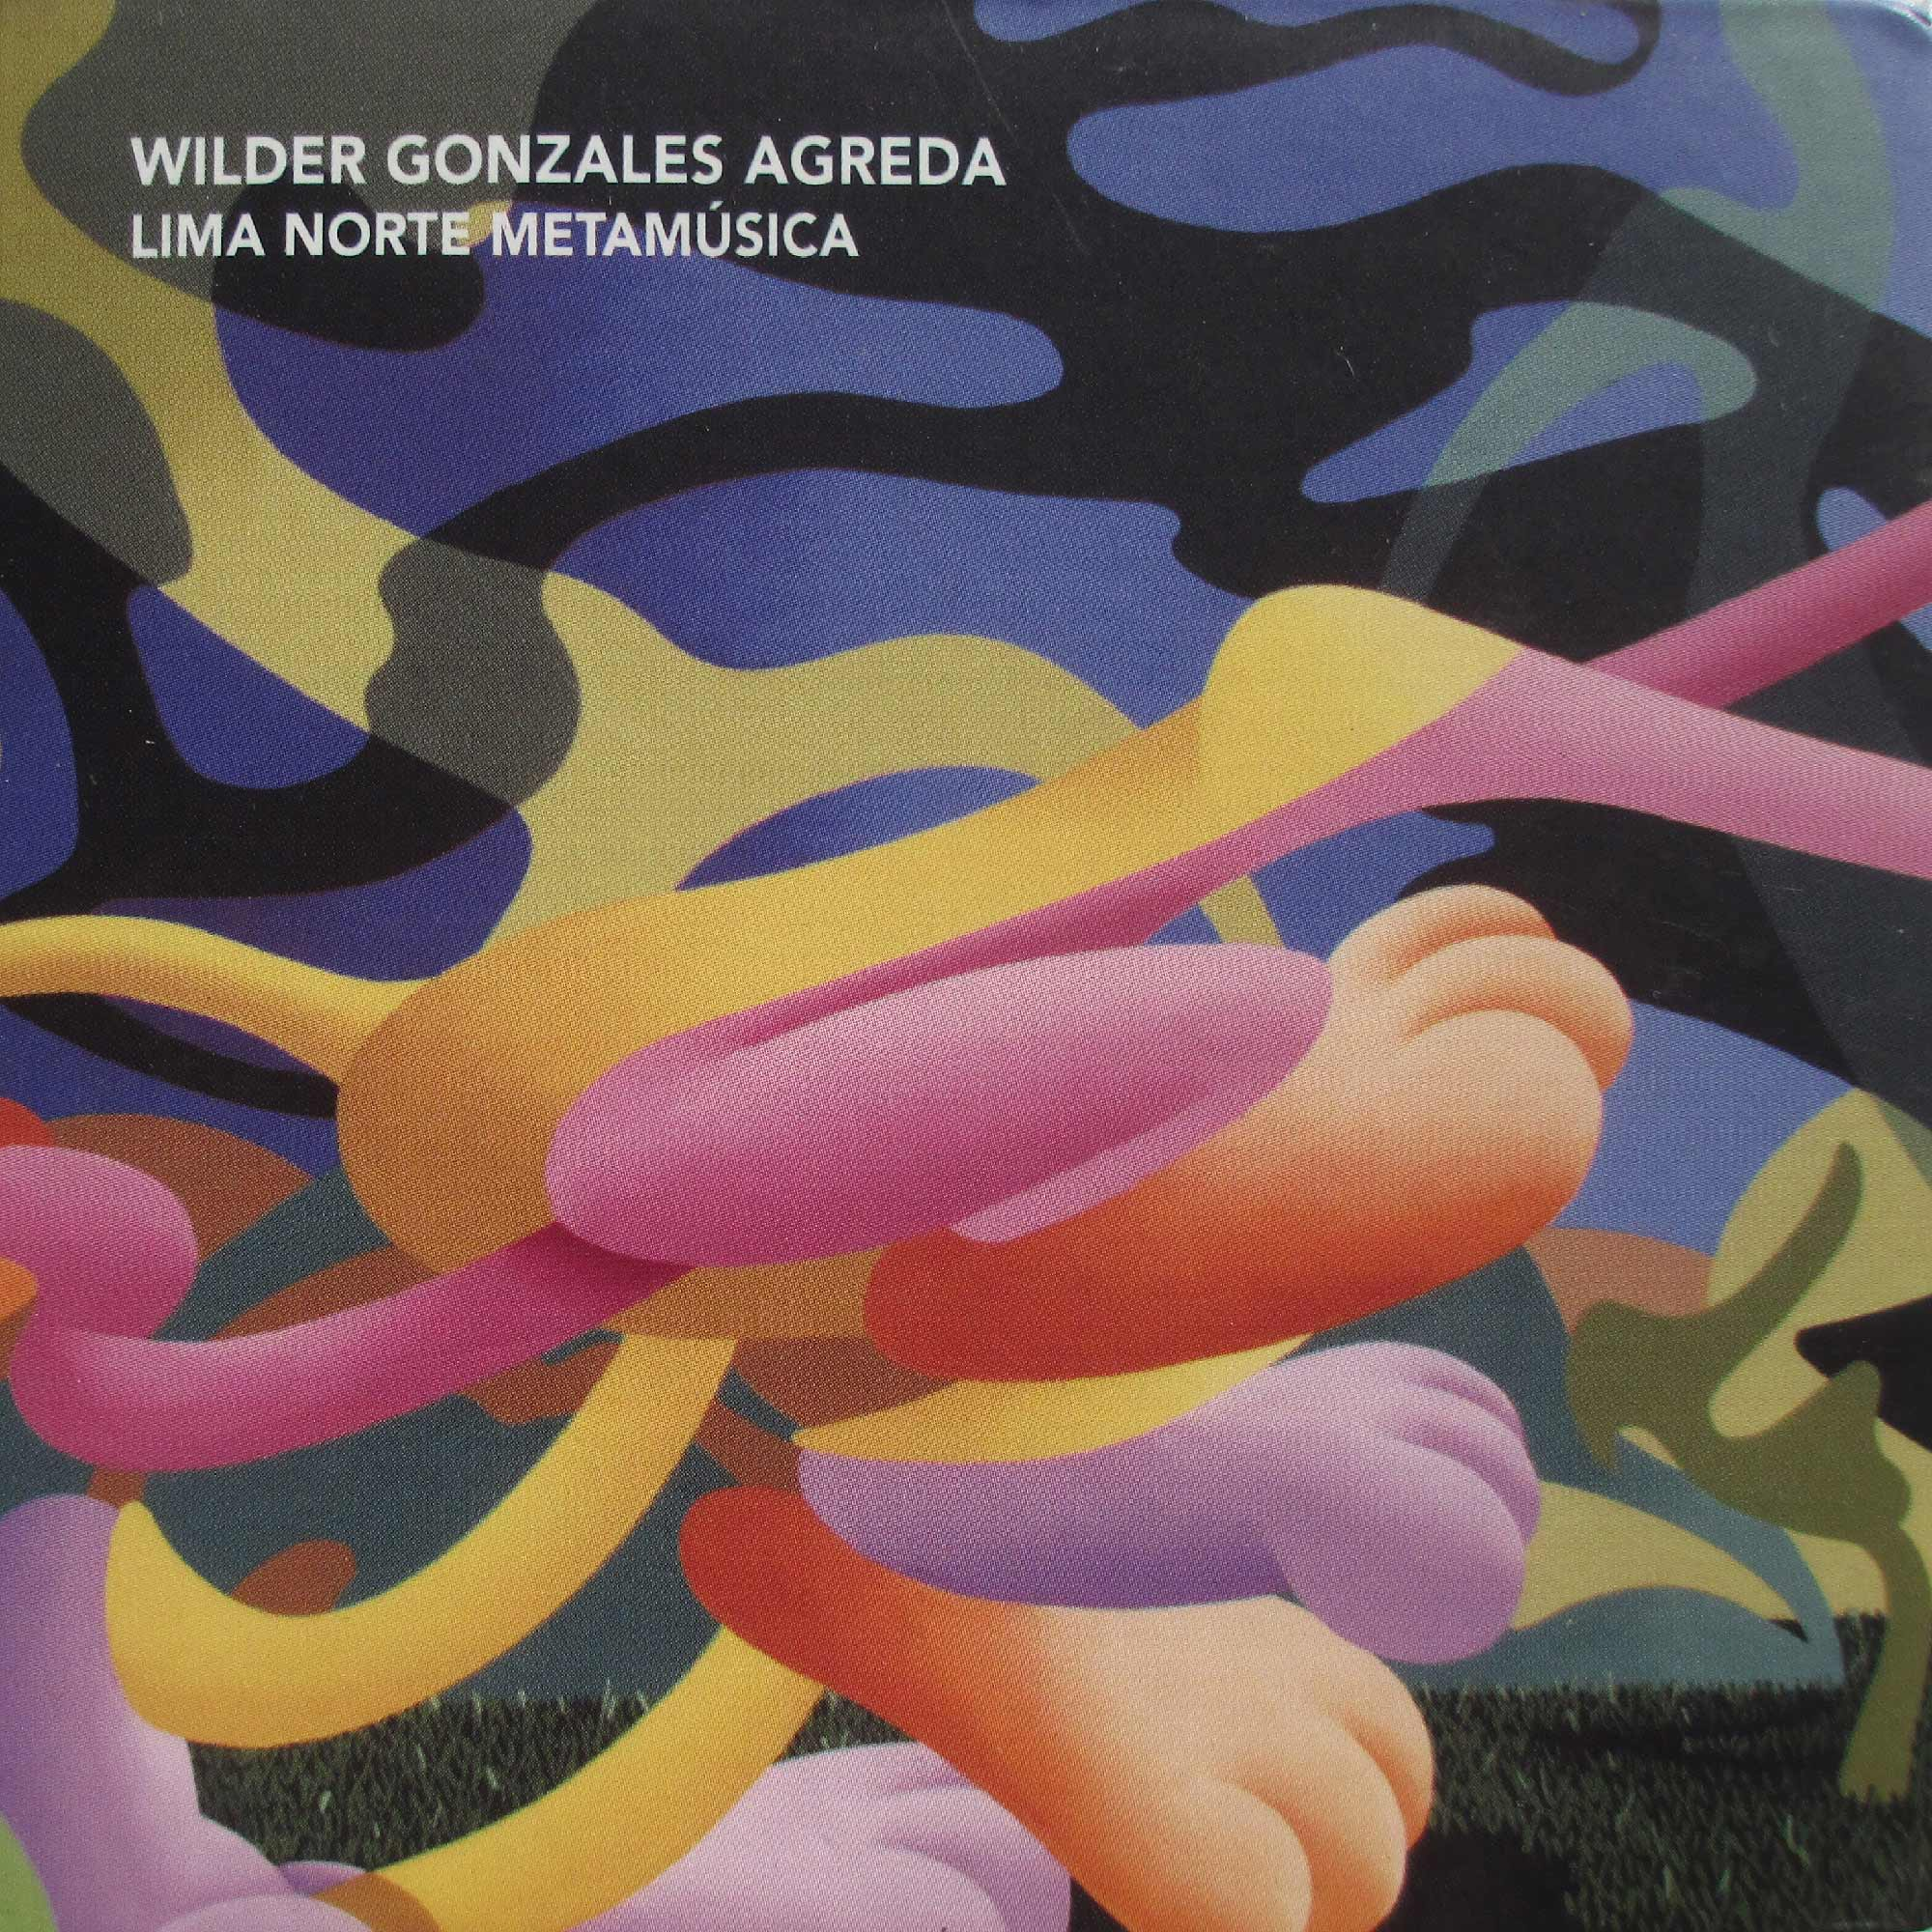 Wilder Gonzales Agreda